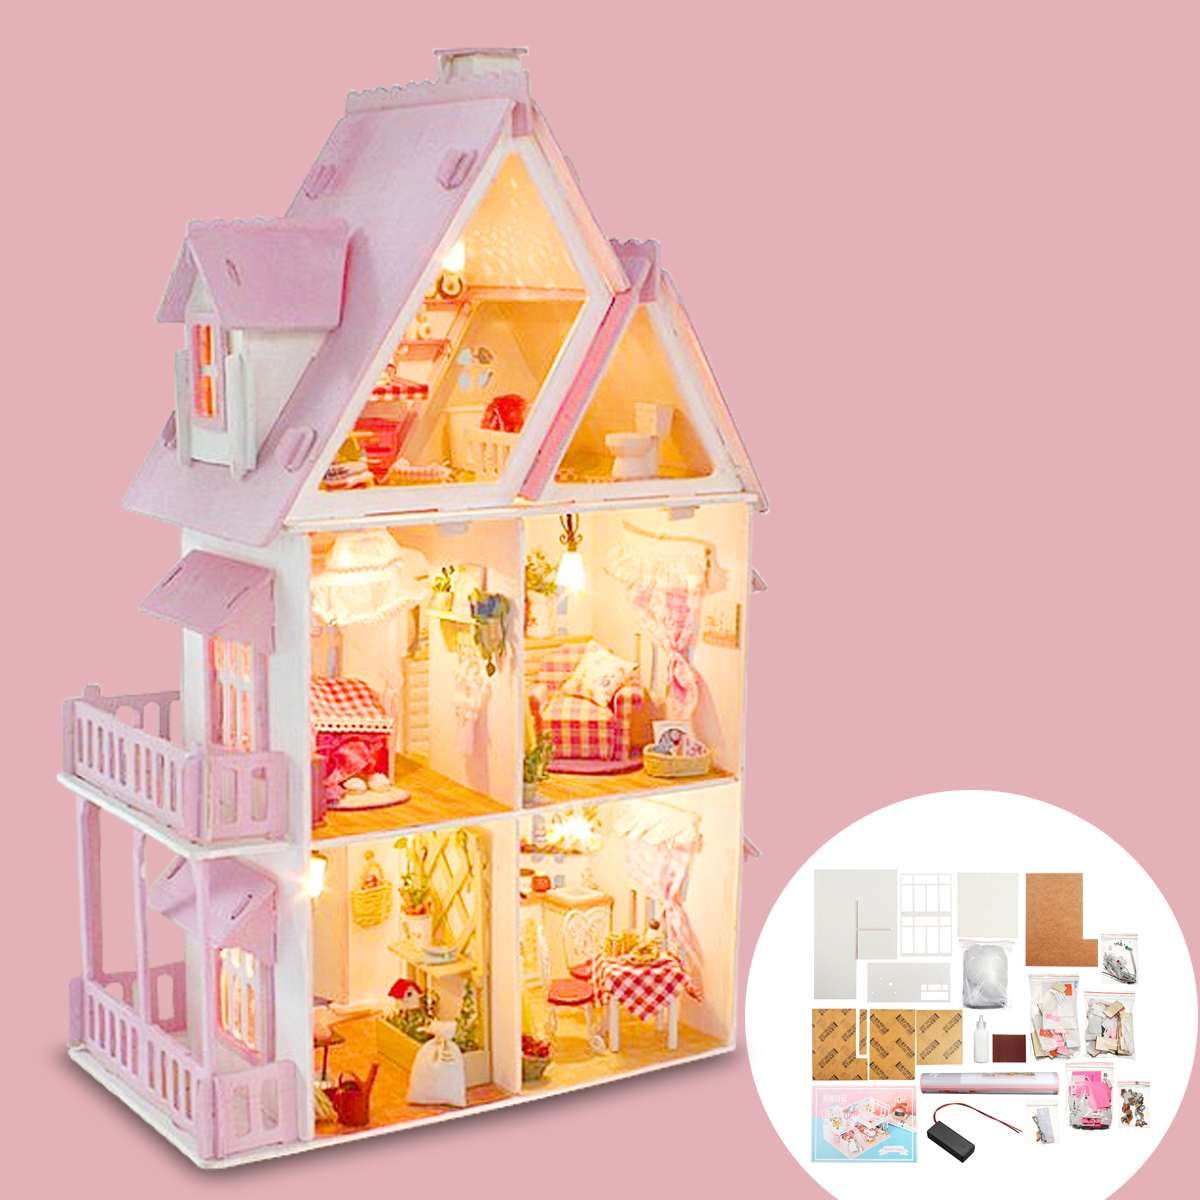 DIY casa de muñecas de madera miniatura caja hecha a mano LED luz miniatura casa de muñecas muebles casa de muñecas accesorios para regalo de niños